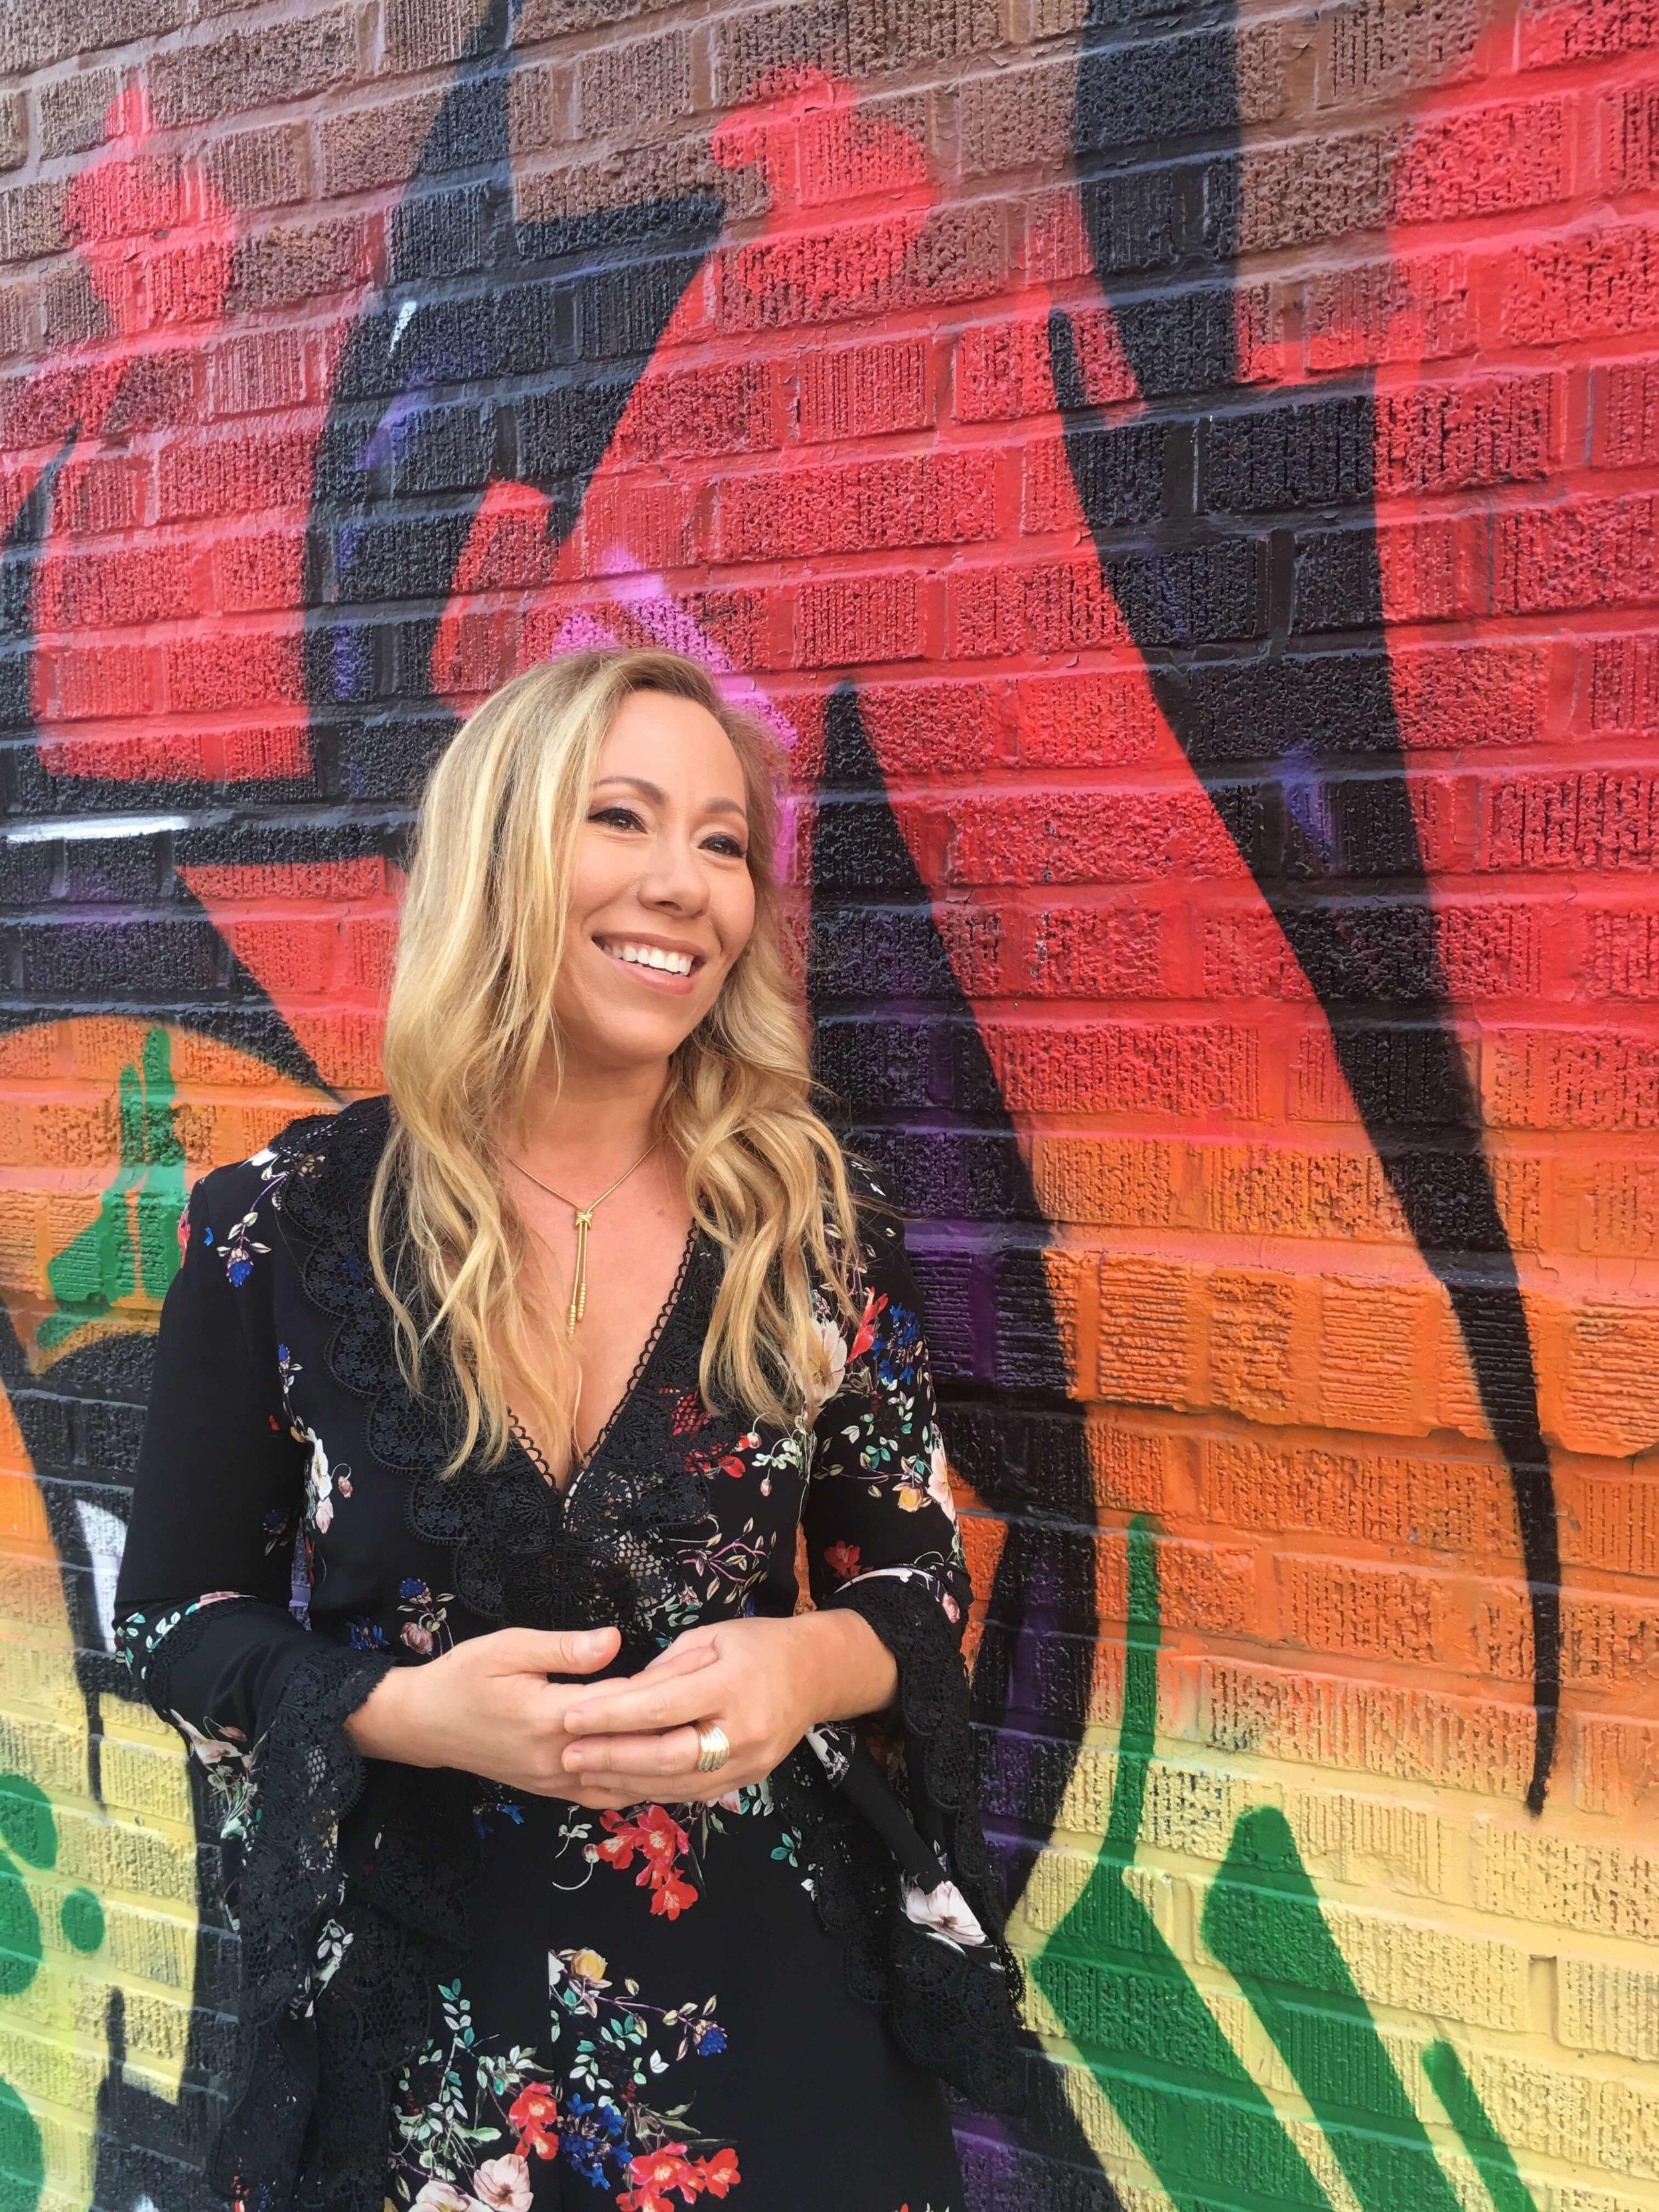 Hi, I'm Kristin. - I'm a best-selling author, health & wellness advocate, and